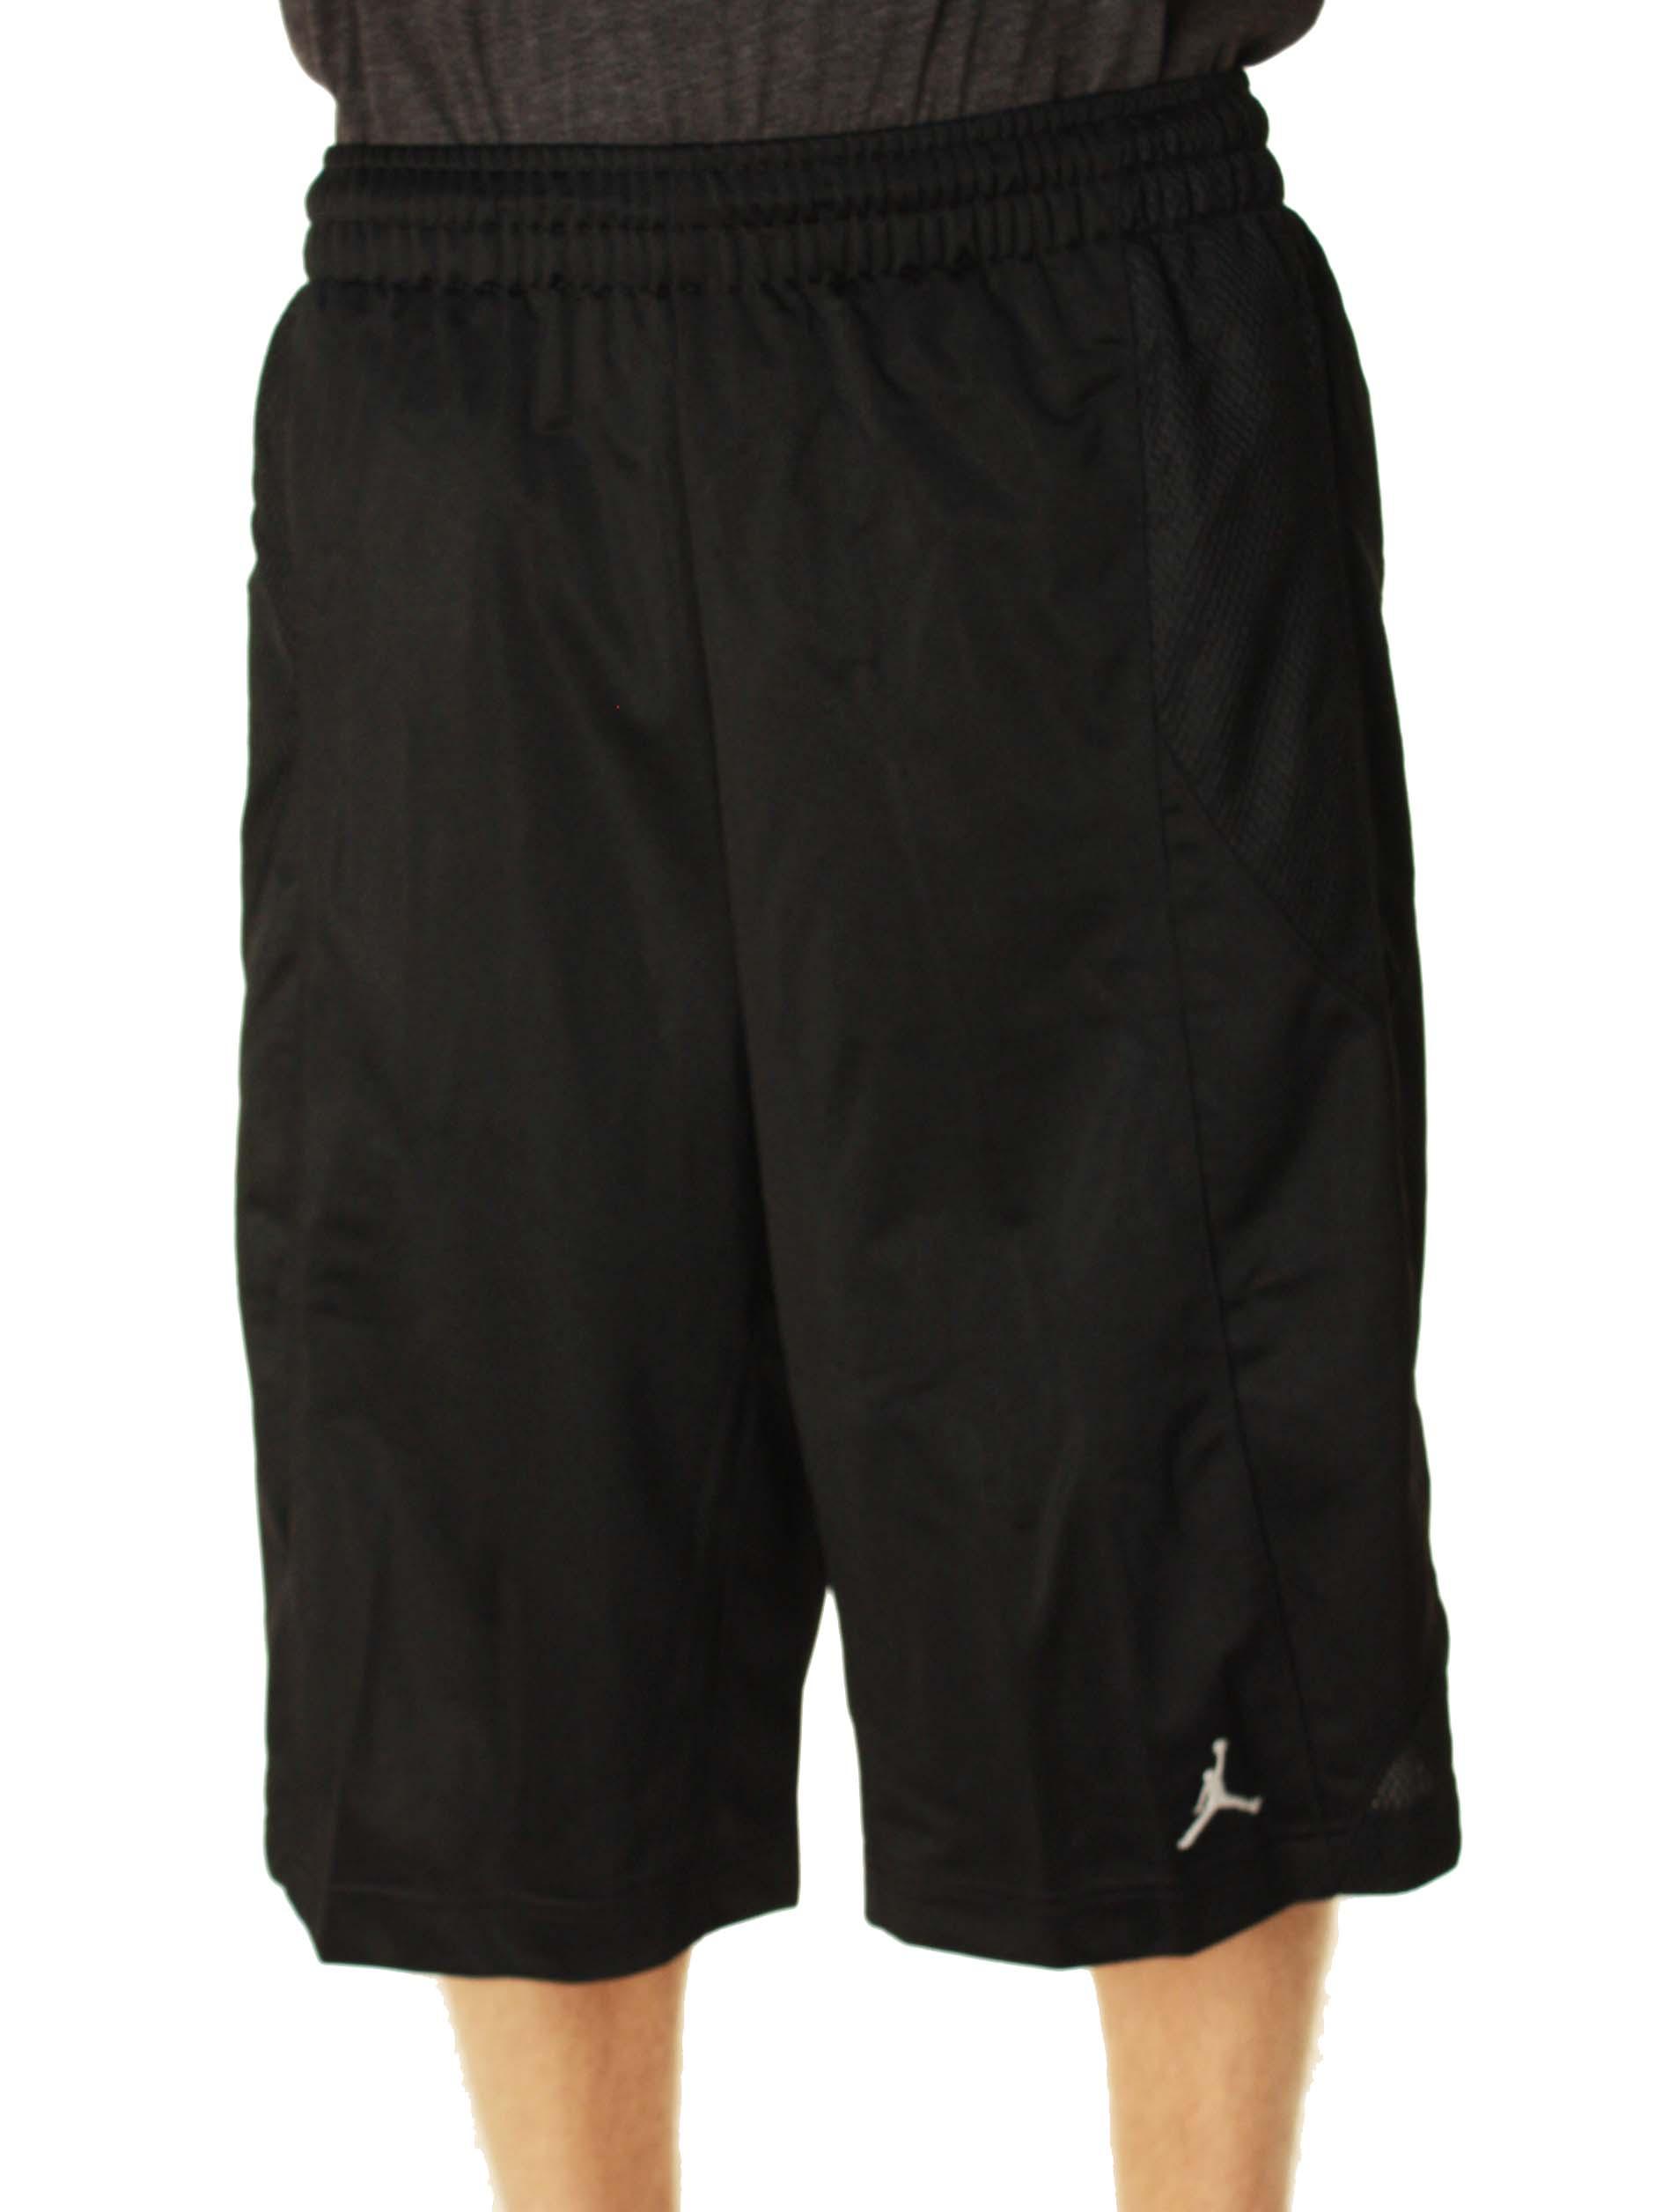 Nike Men's Jumpman 23 Jordan Court Fit Basketball Shorts